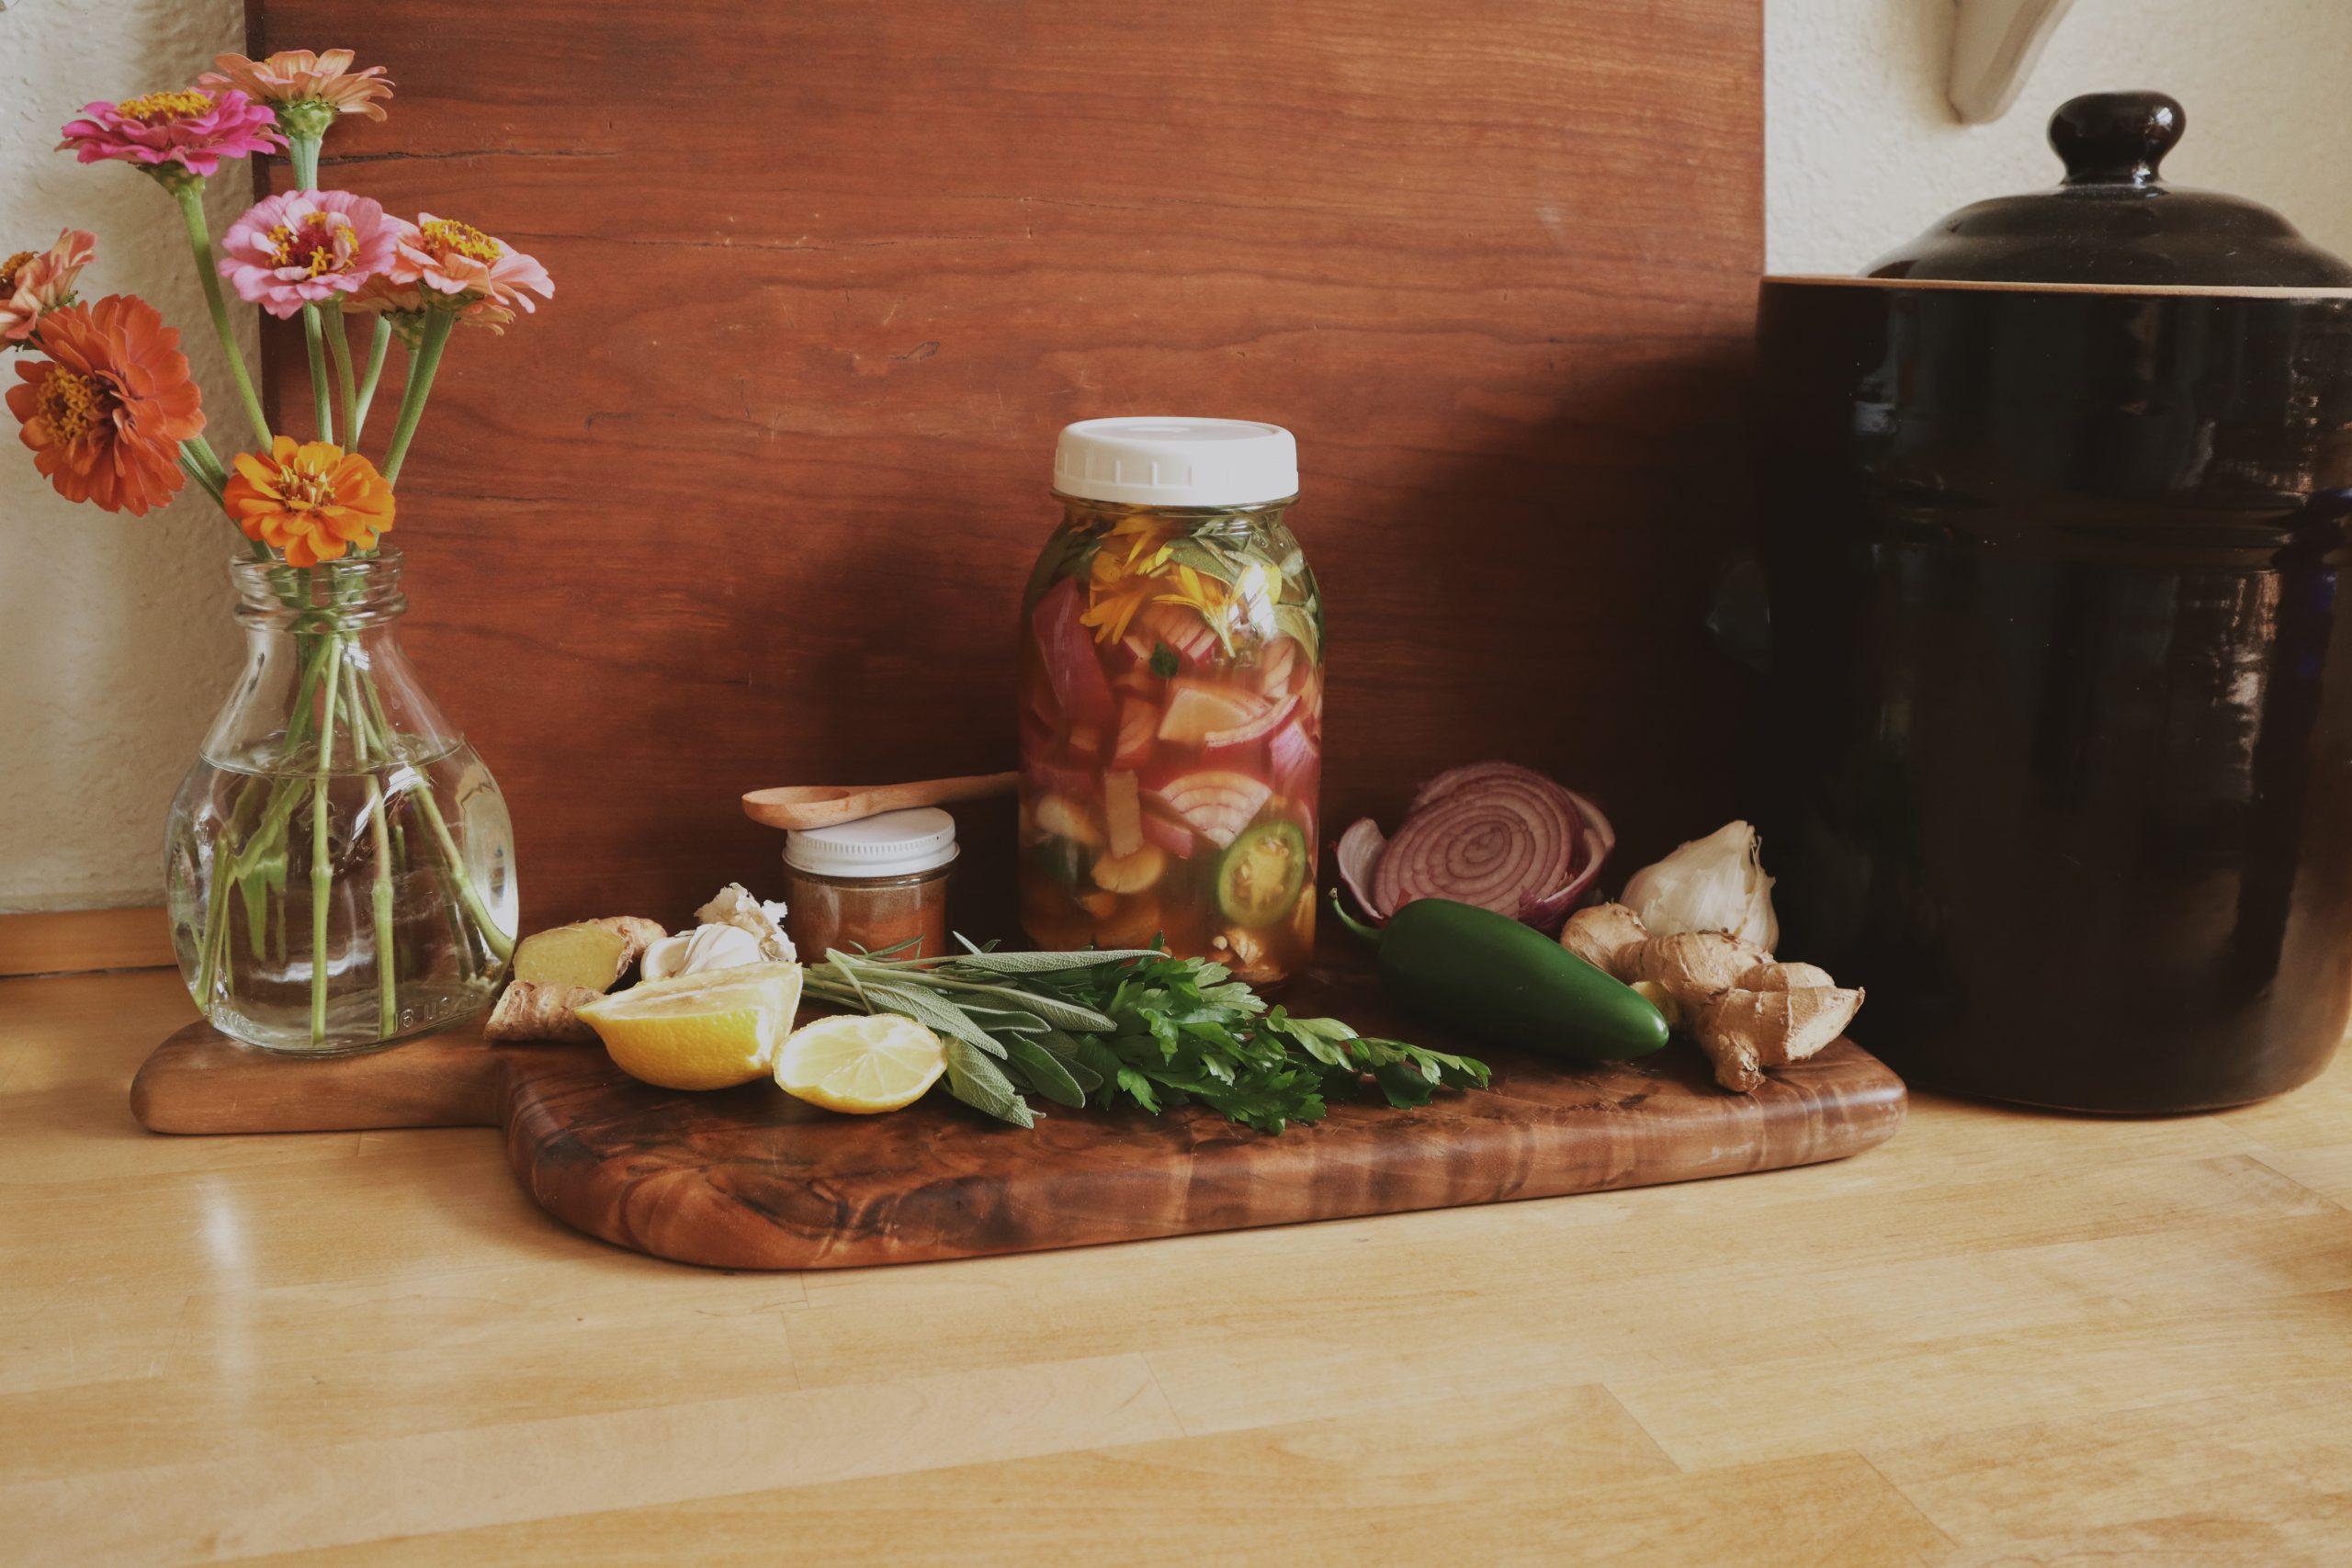 Verity folk school traditional Fire cider herbal remedy on a wooden cutting board